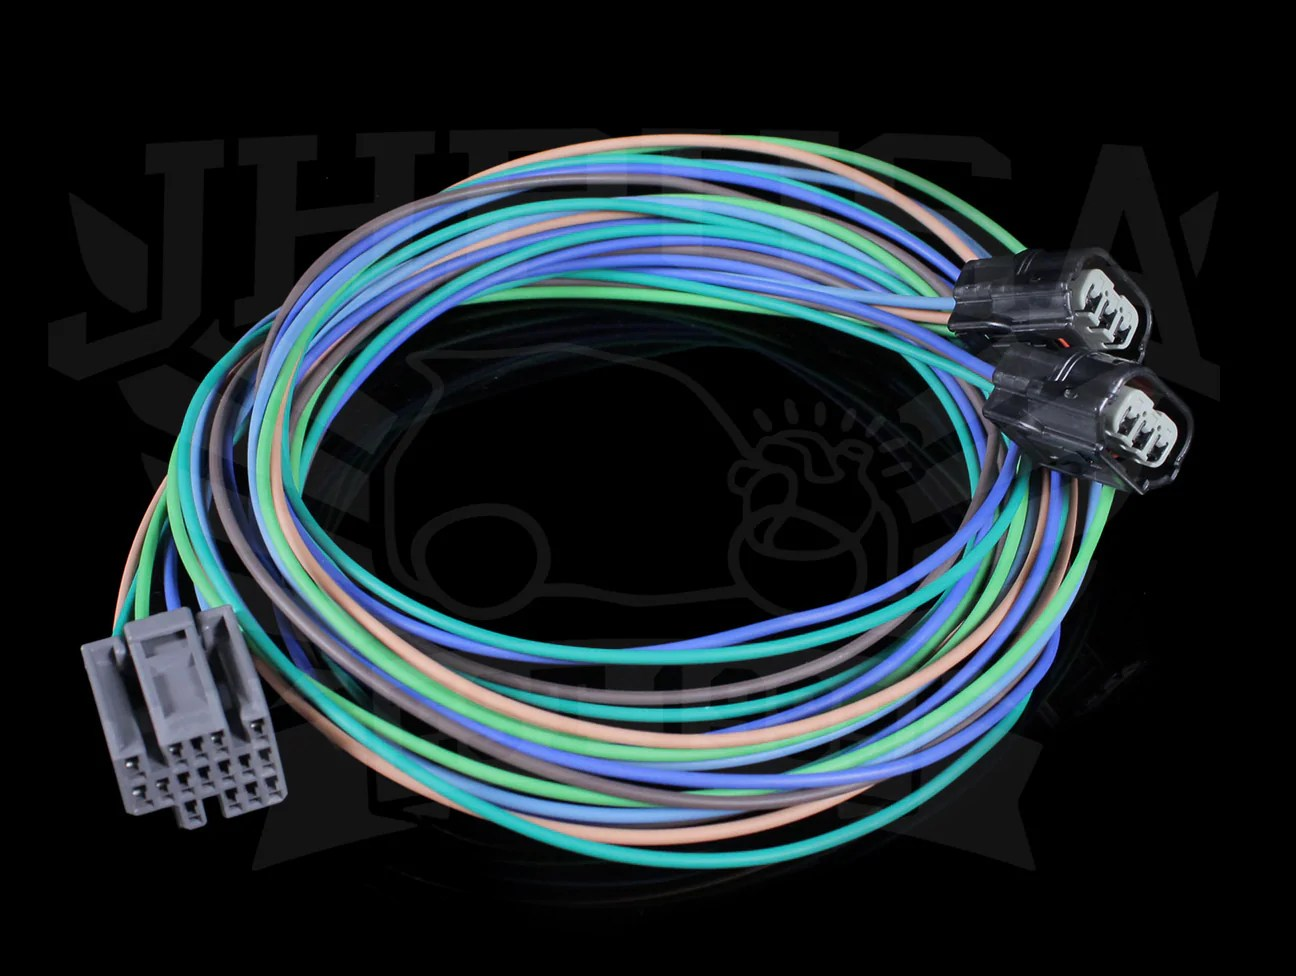 medium resolution of s2000 k pro wiring harness install wiring diagram used s2000 k pro wiring harness